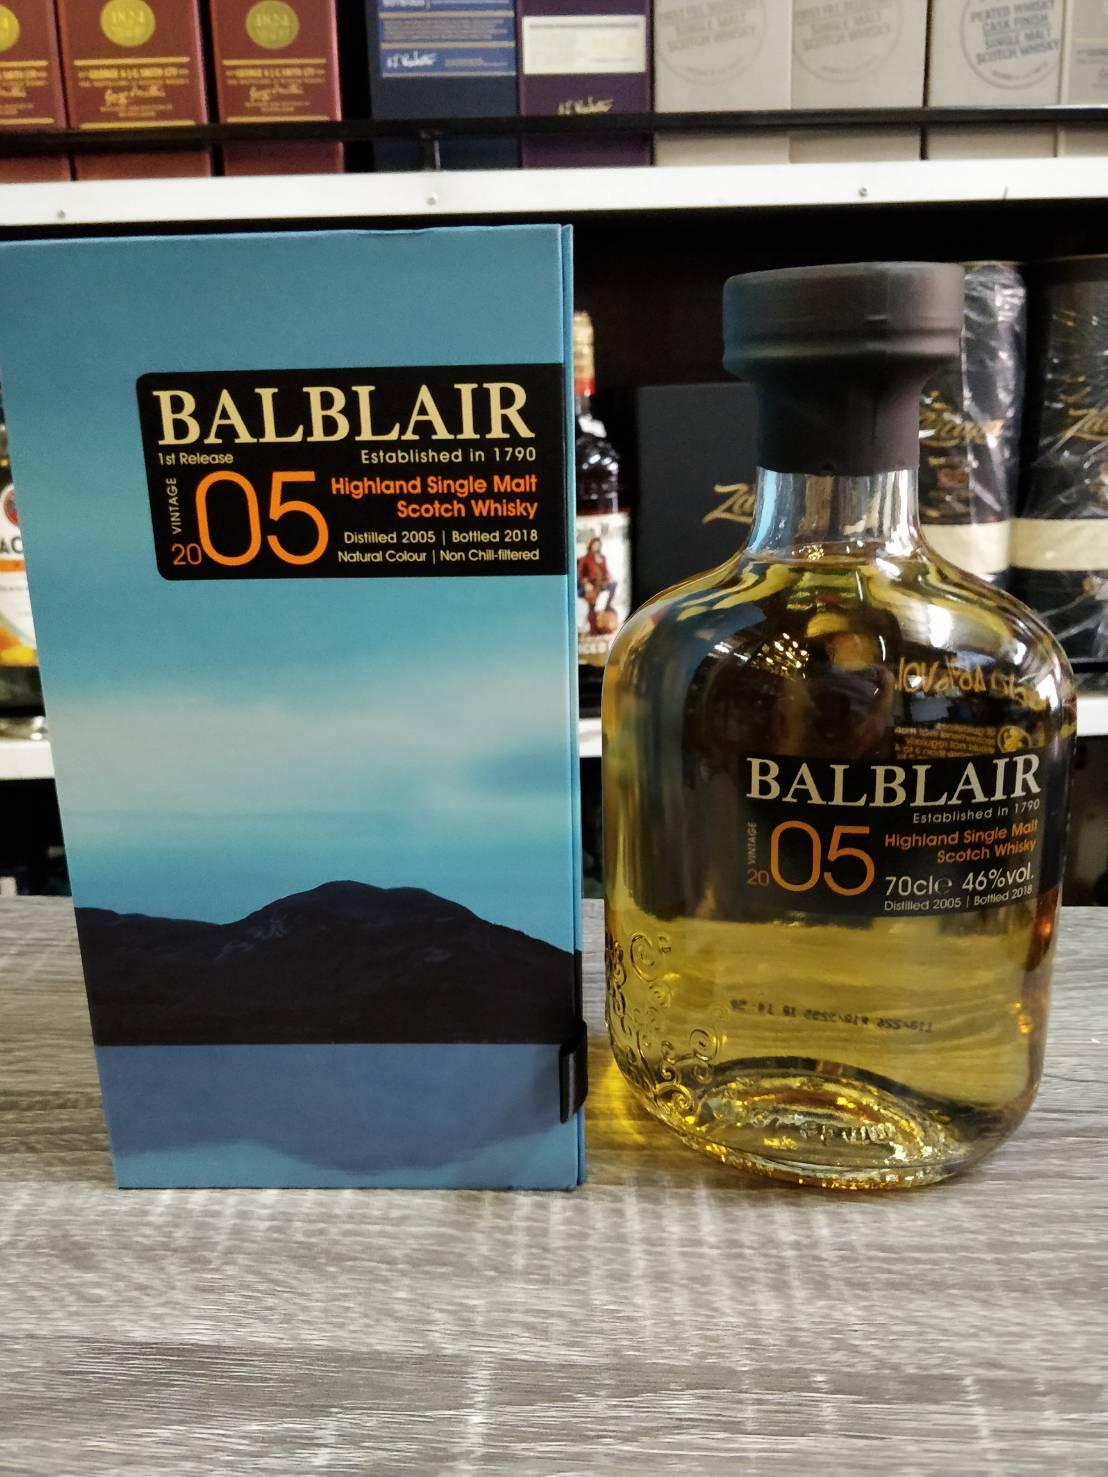 Balblair 2005 - 1st Release (70cl, 46%)